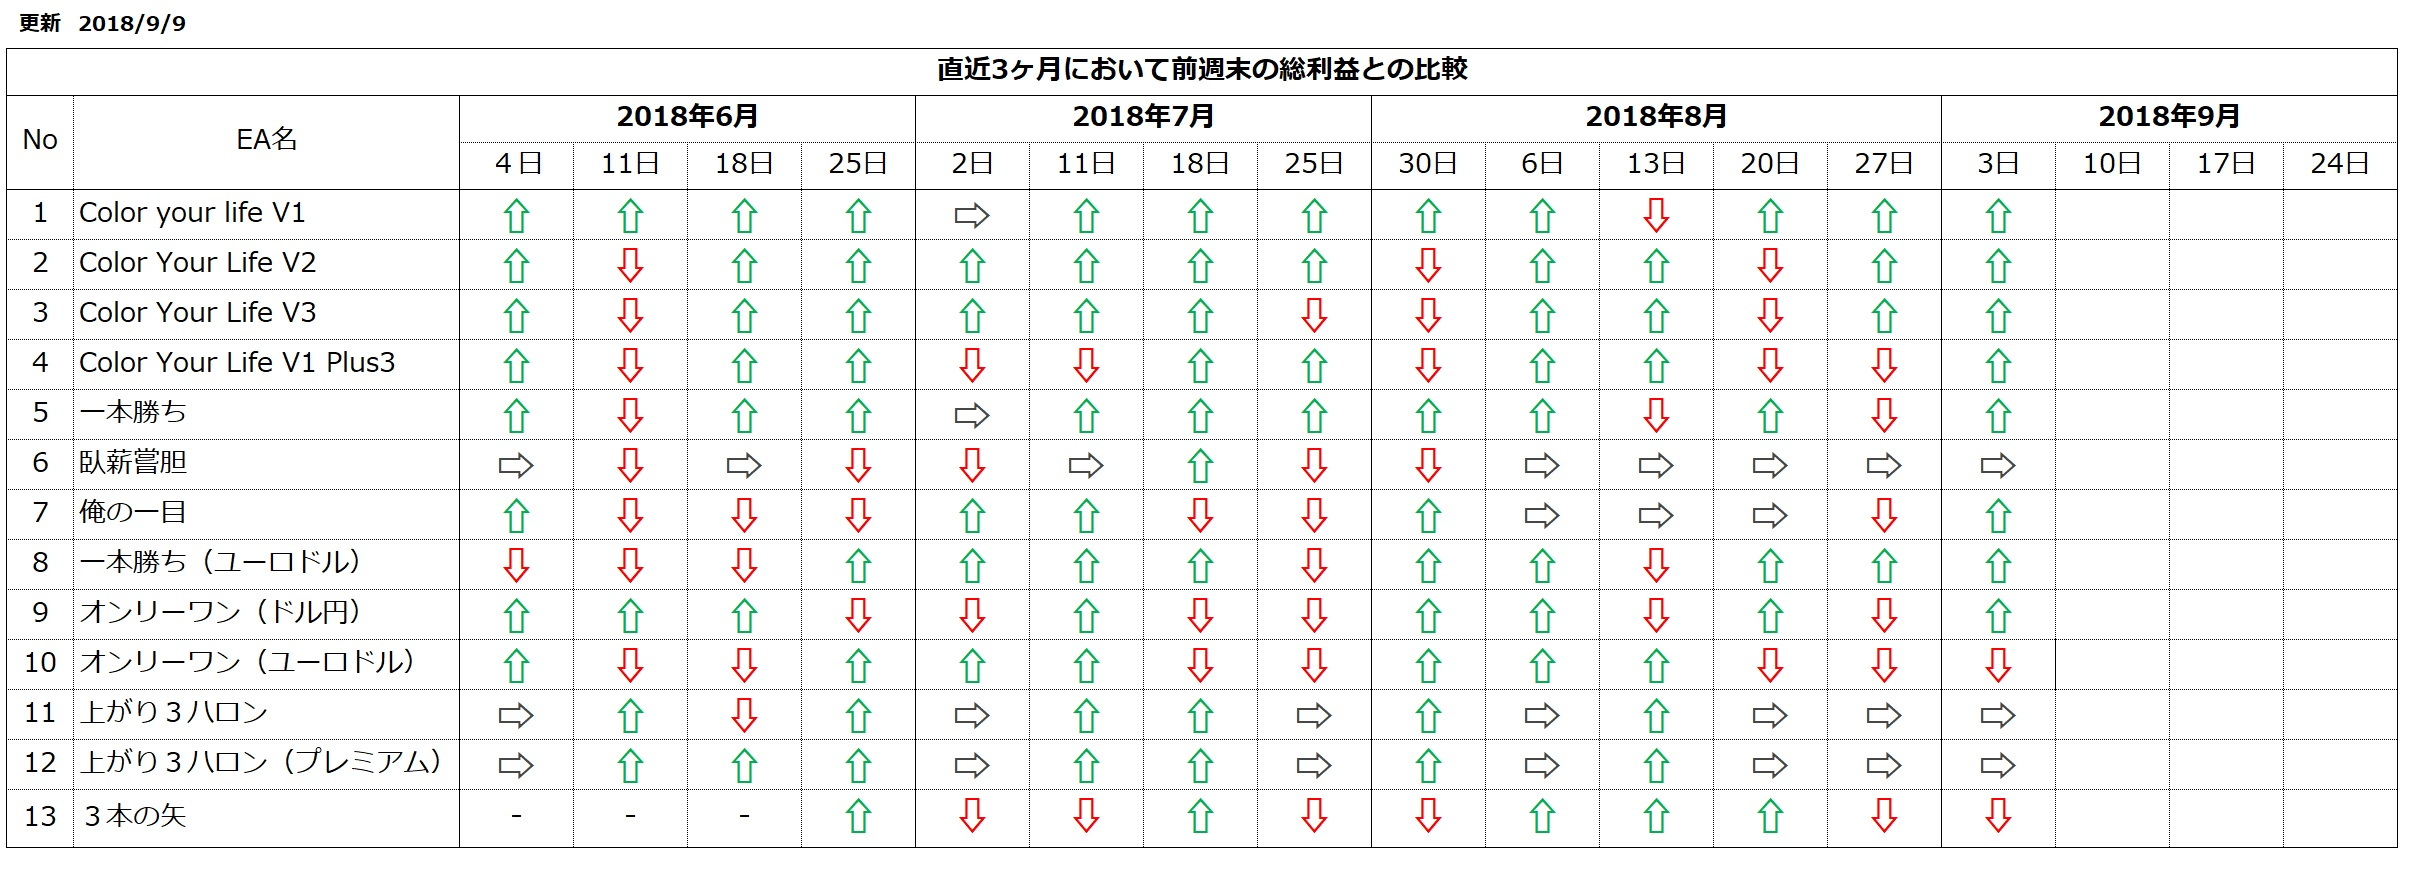 comment_20180909_1.jpg